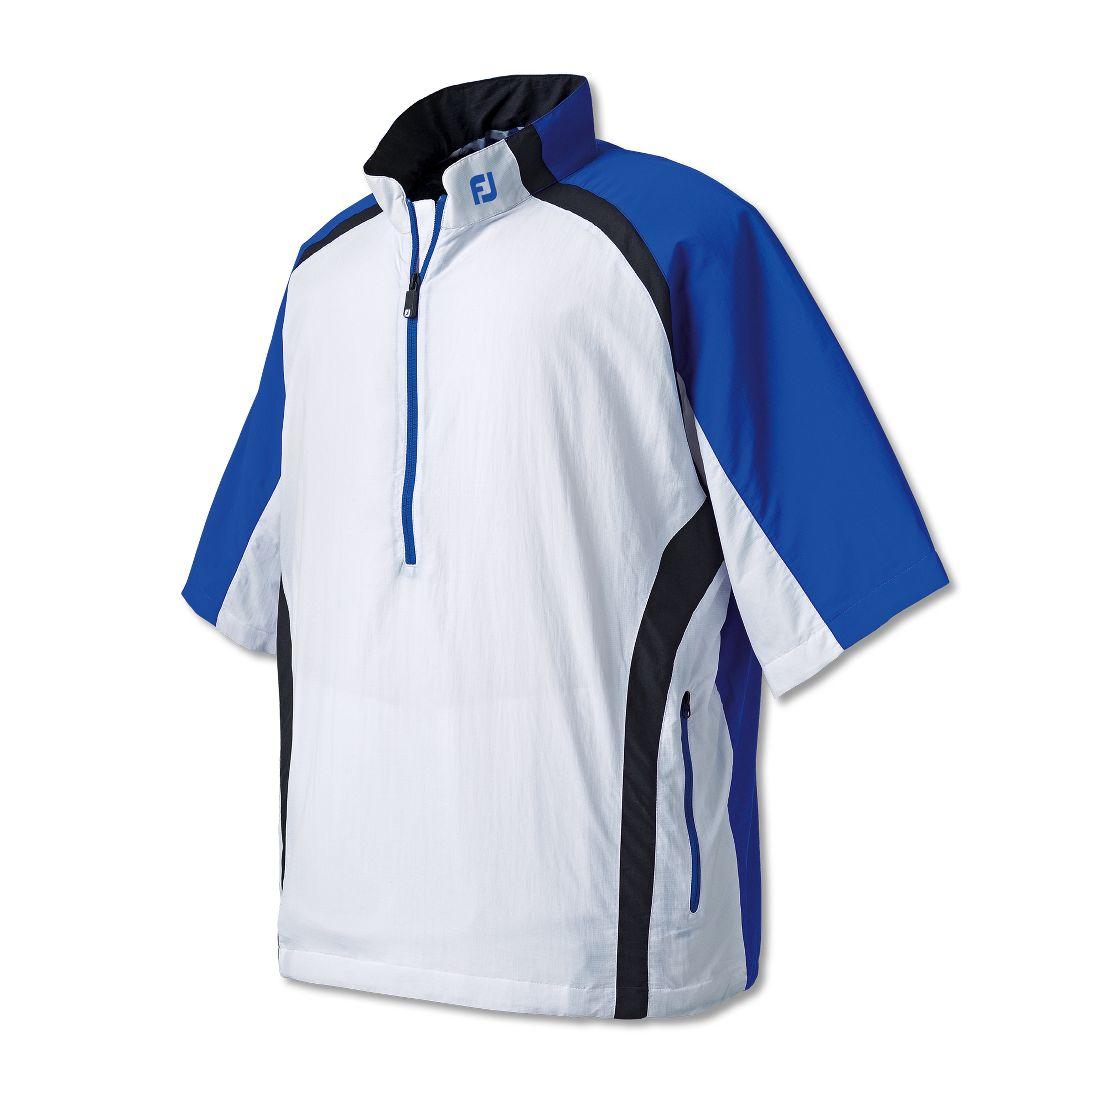 fj sport windshirt short